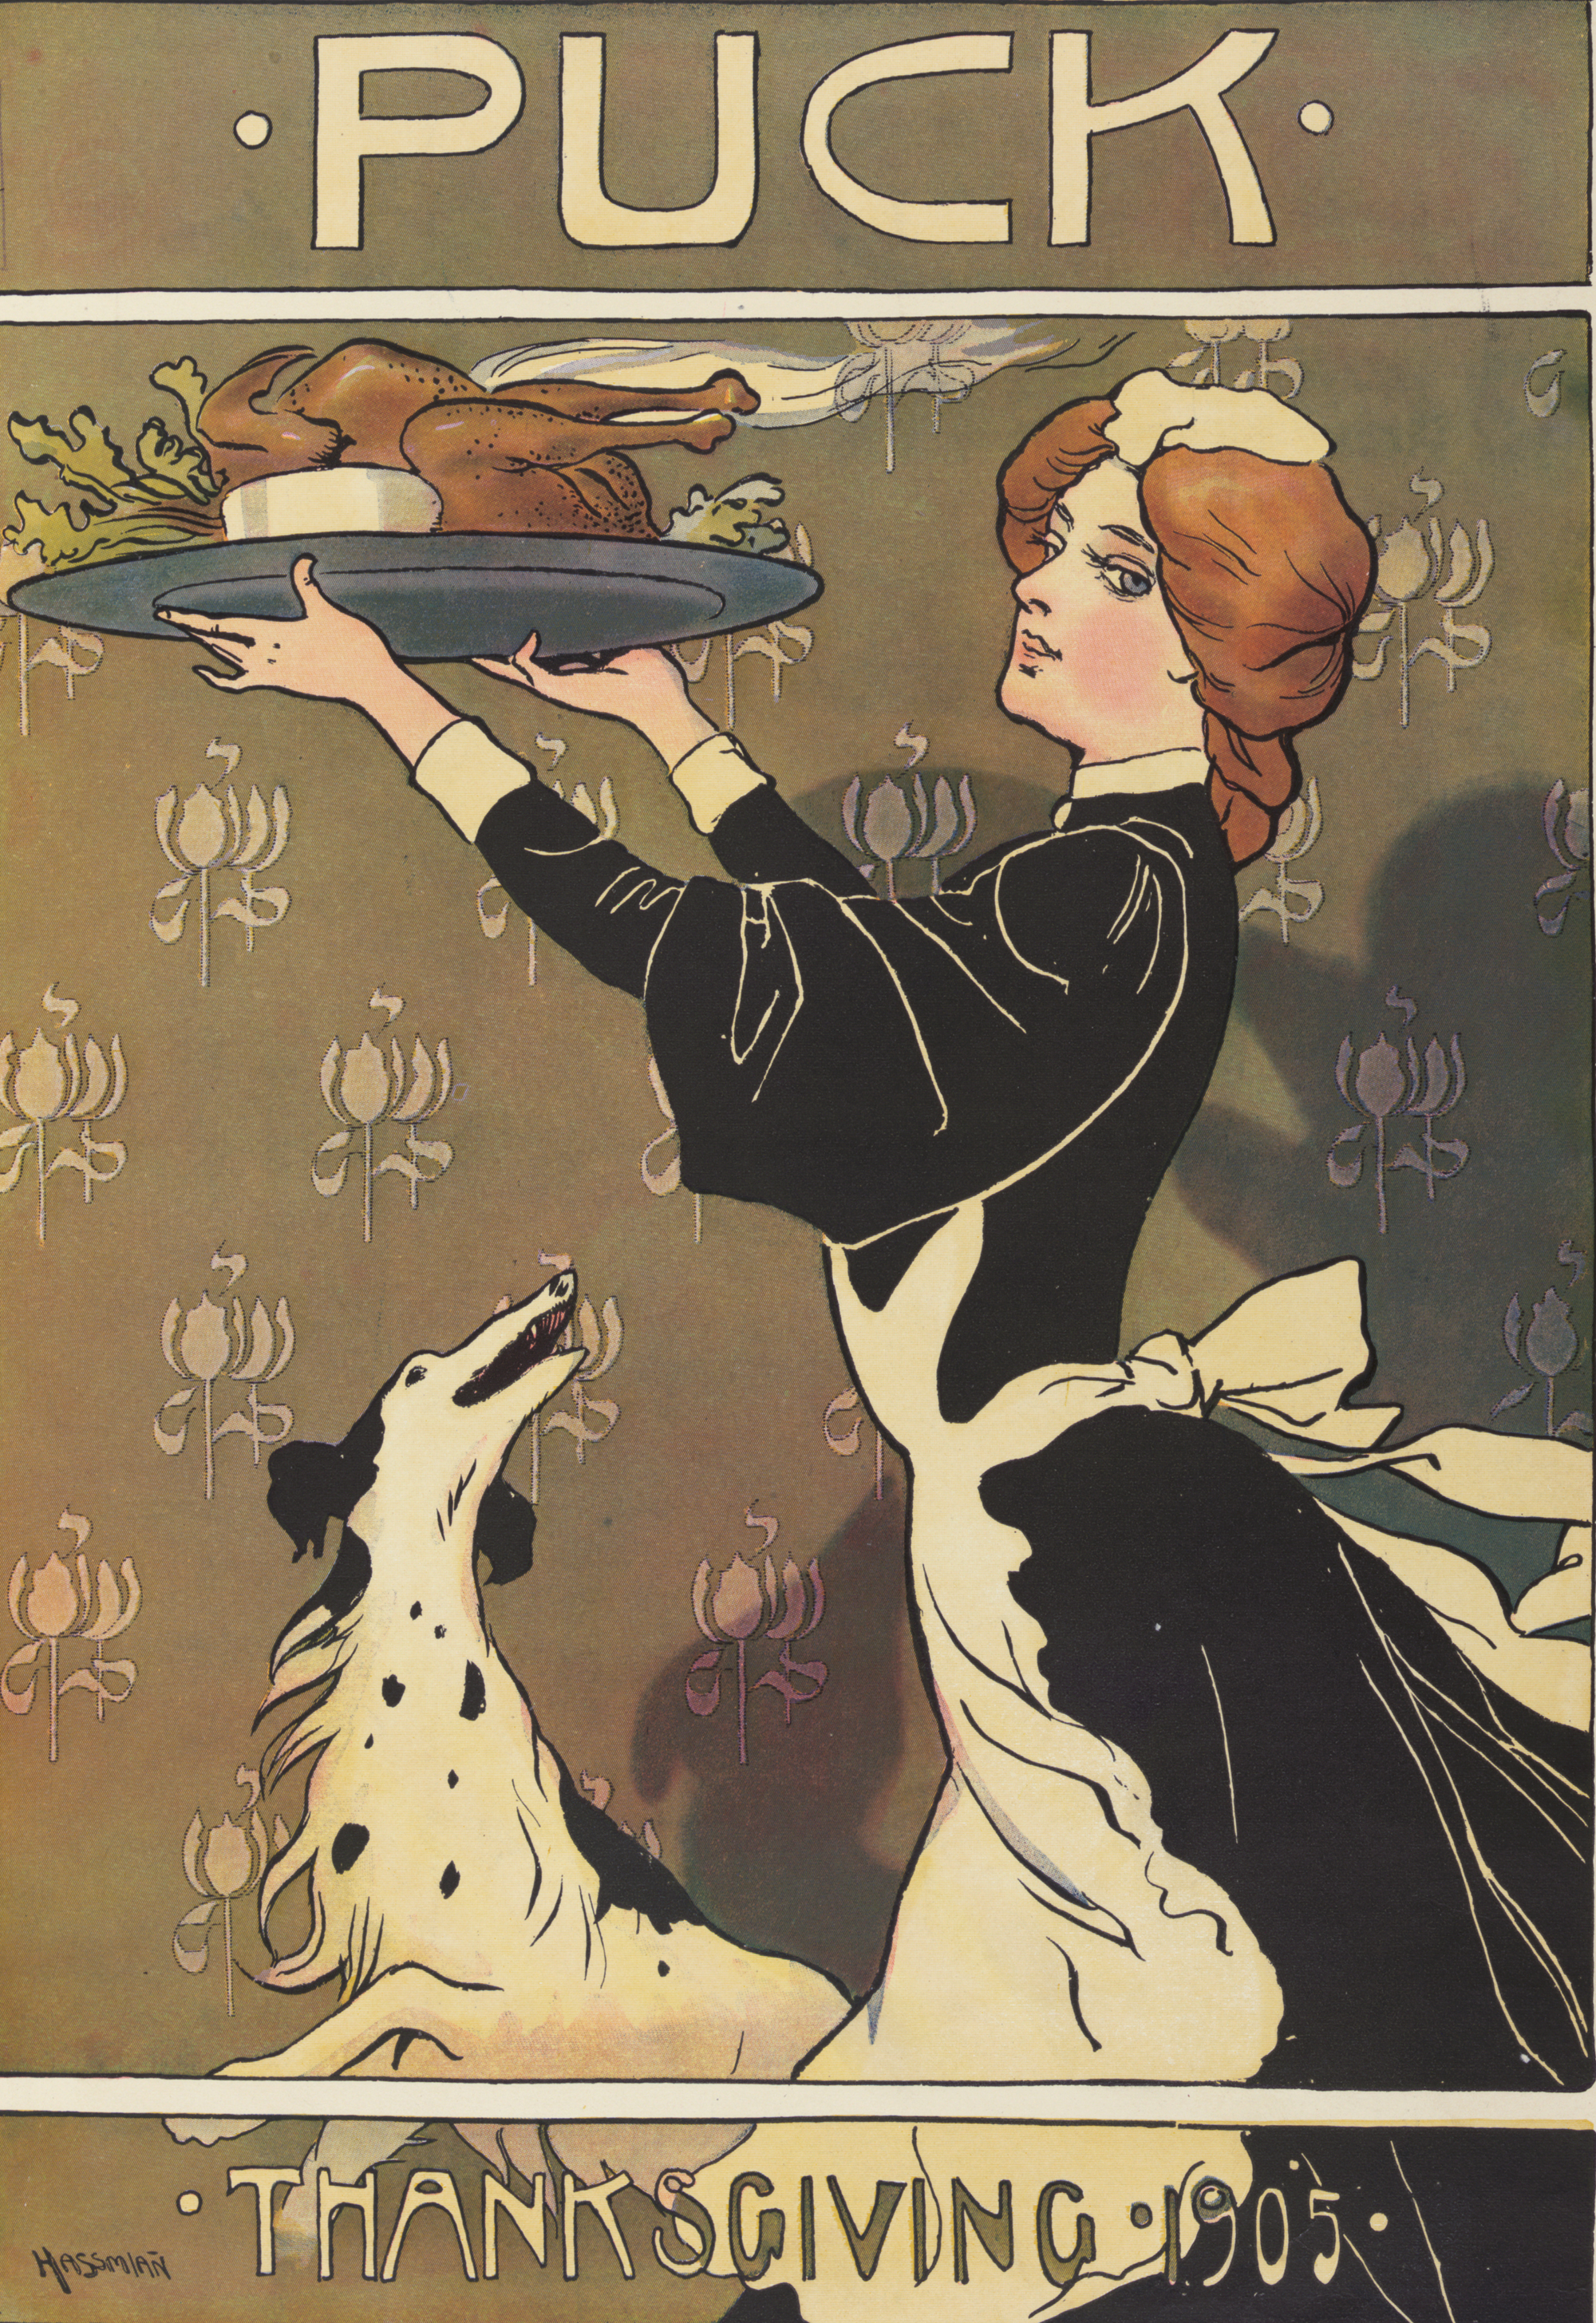 Puck Magazine Thanksgiving 1905 by Carl Hassmann